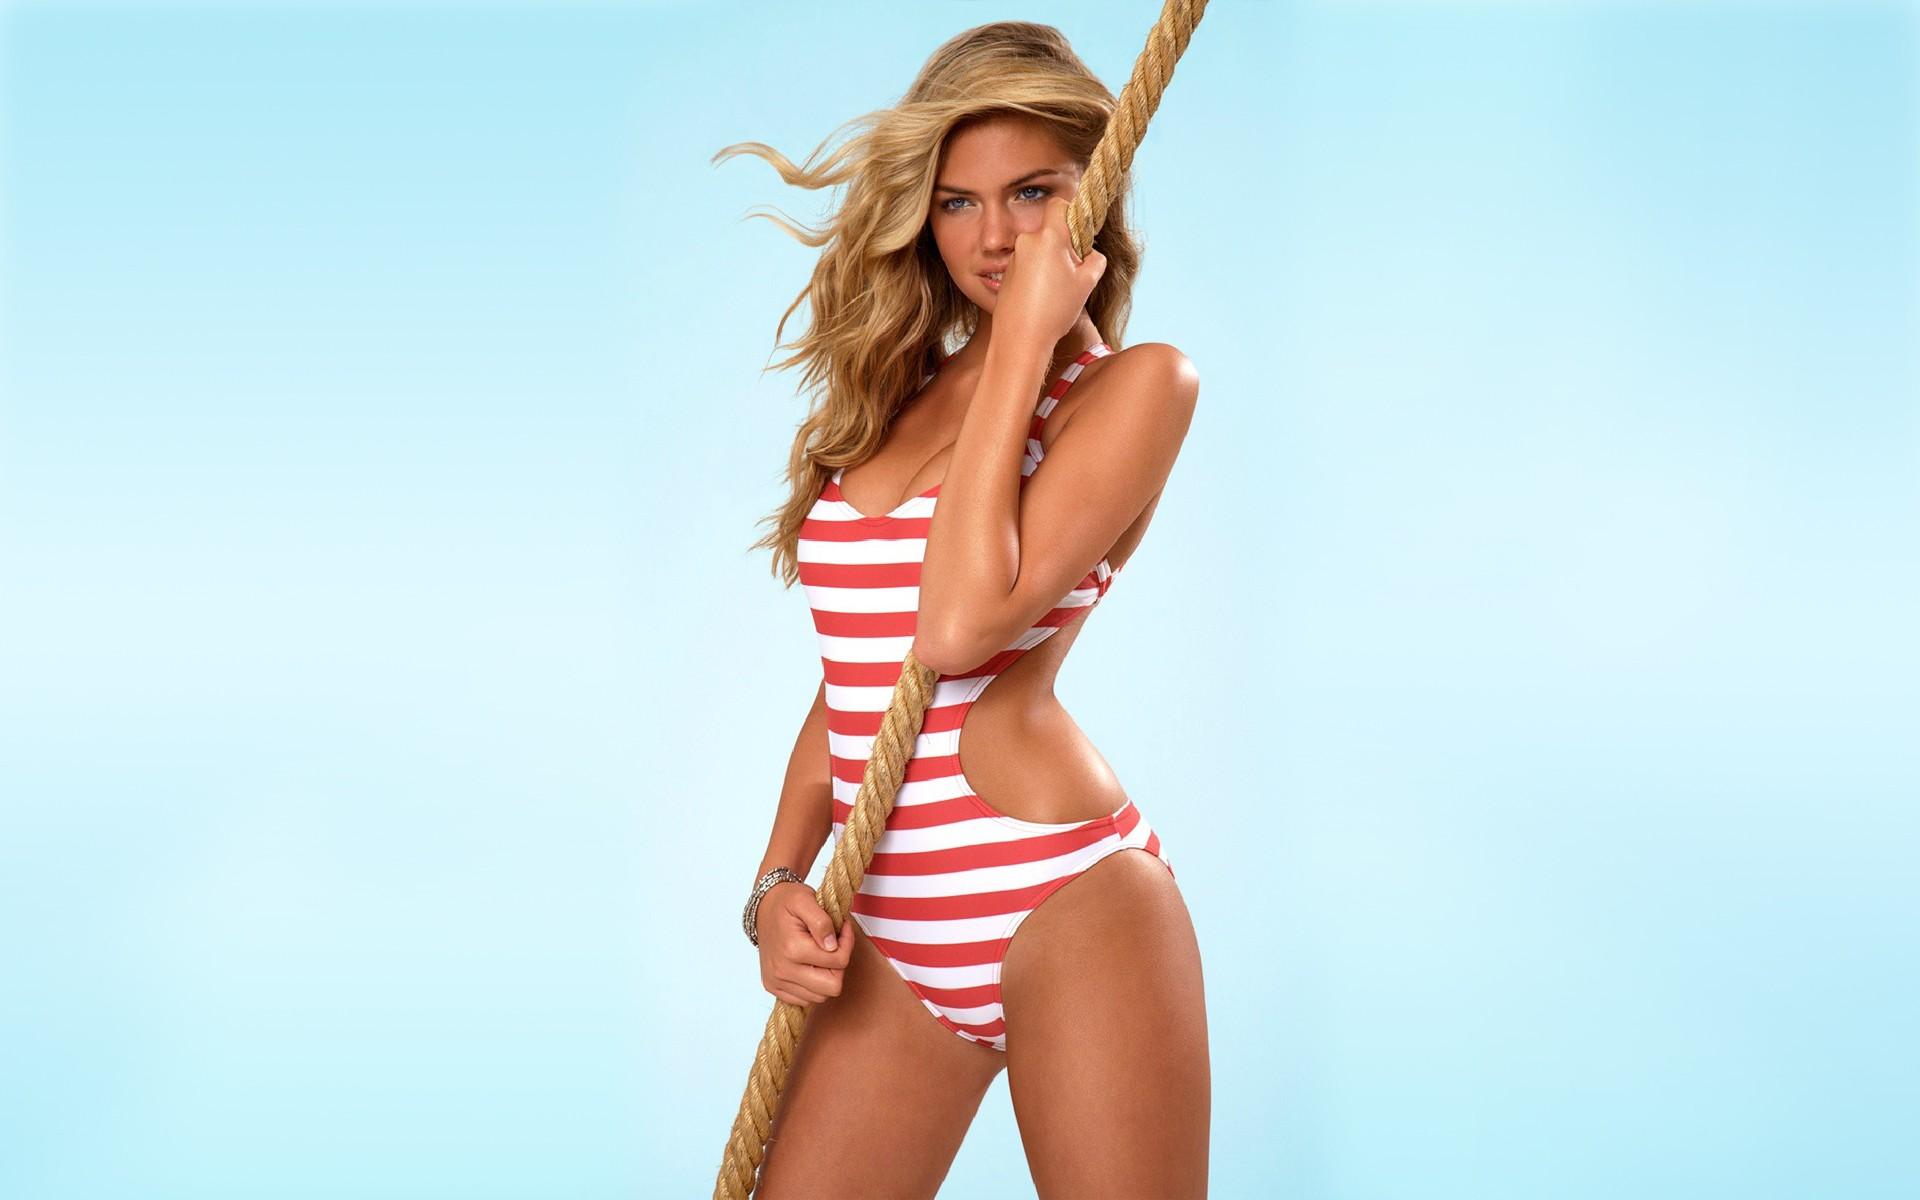 Model ropes swimwear blonde simple background kate upton download wallpaper voltagebd Gallery